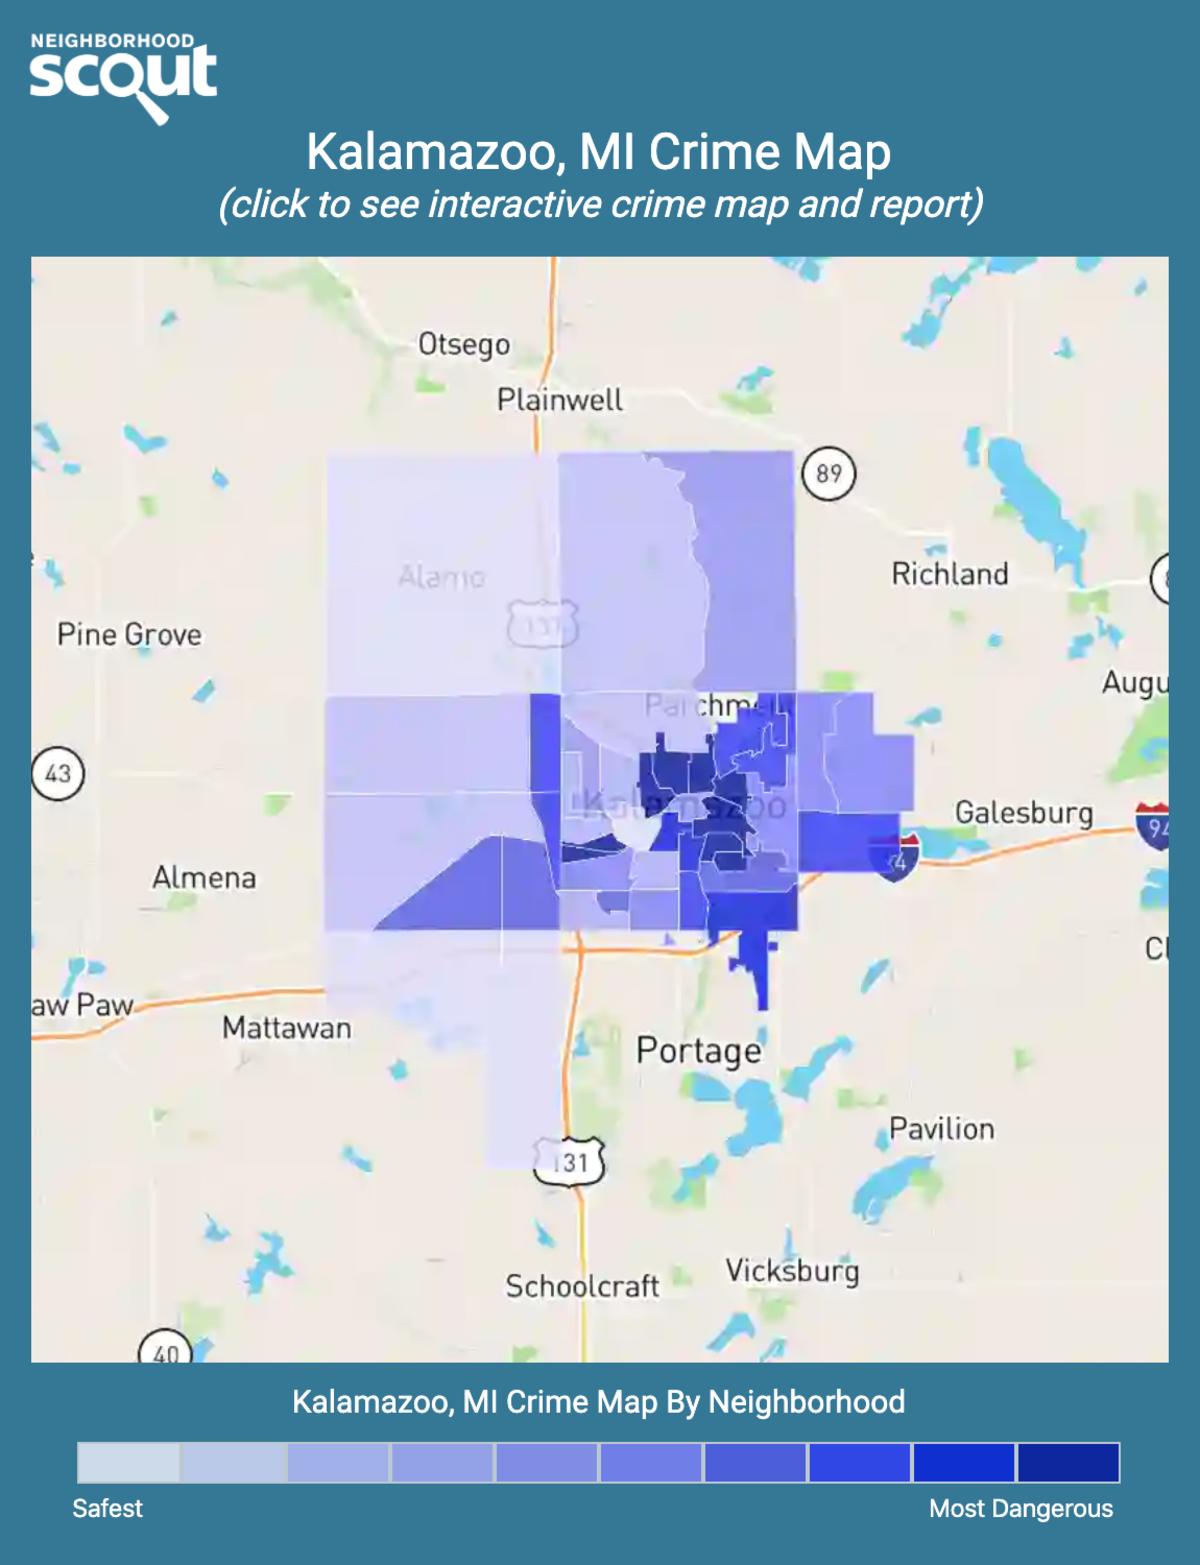 Kalamazoo, Michigan crime map